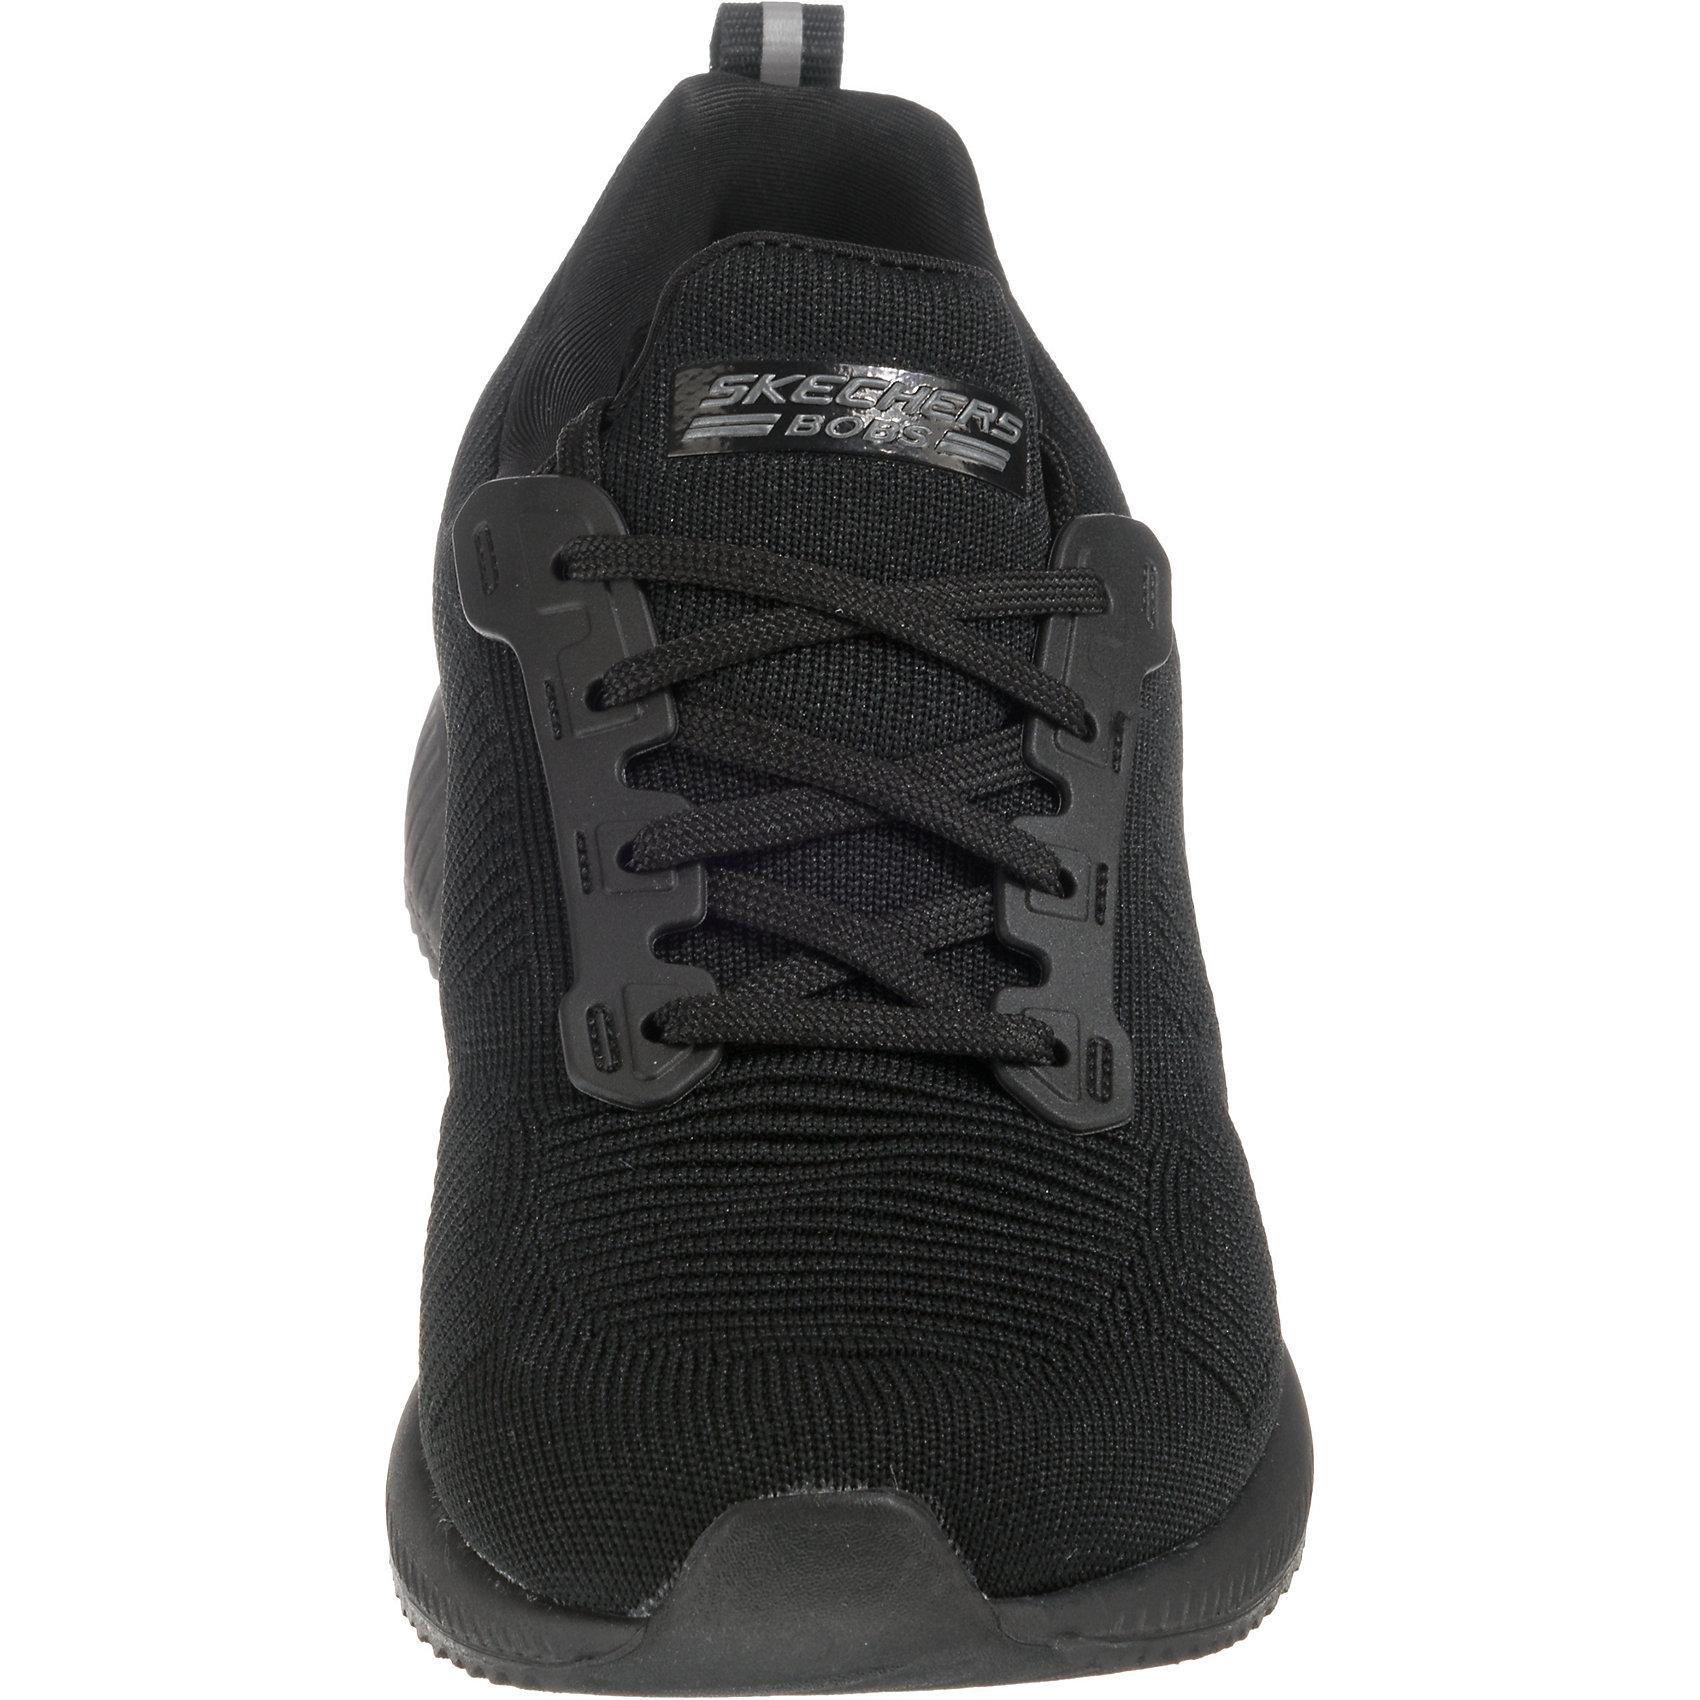 Neu SKECHERS BOBS SQUADPHOTO FRAME Sneakers Low 7393464 für Damen